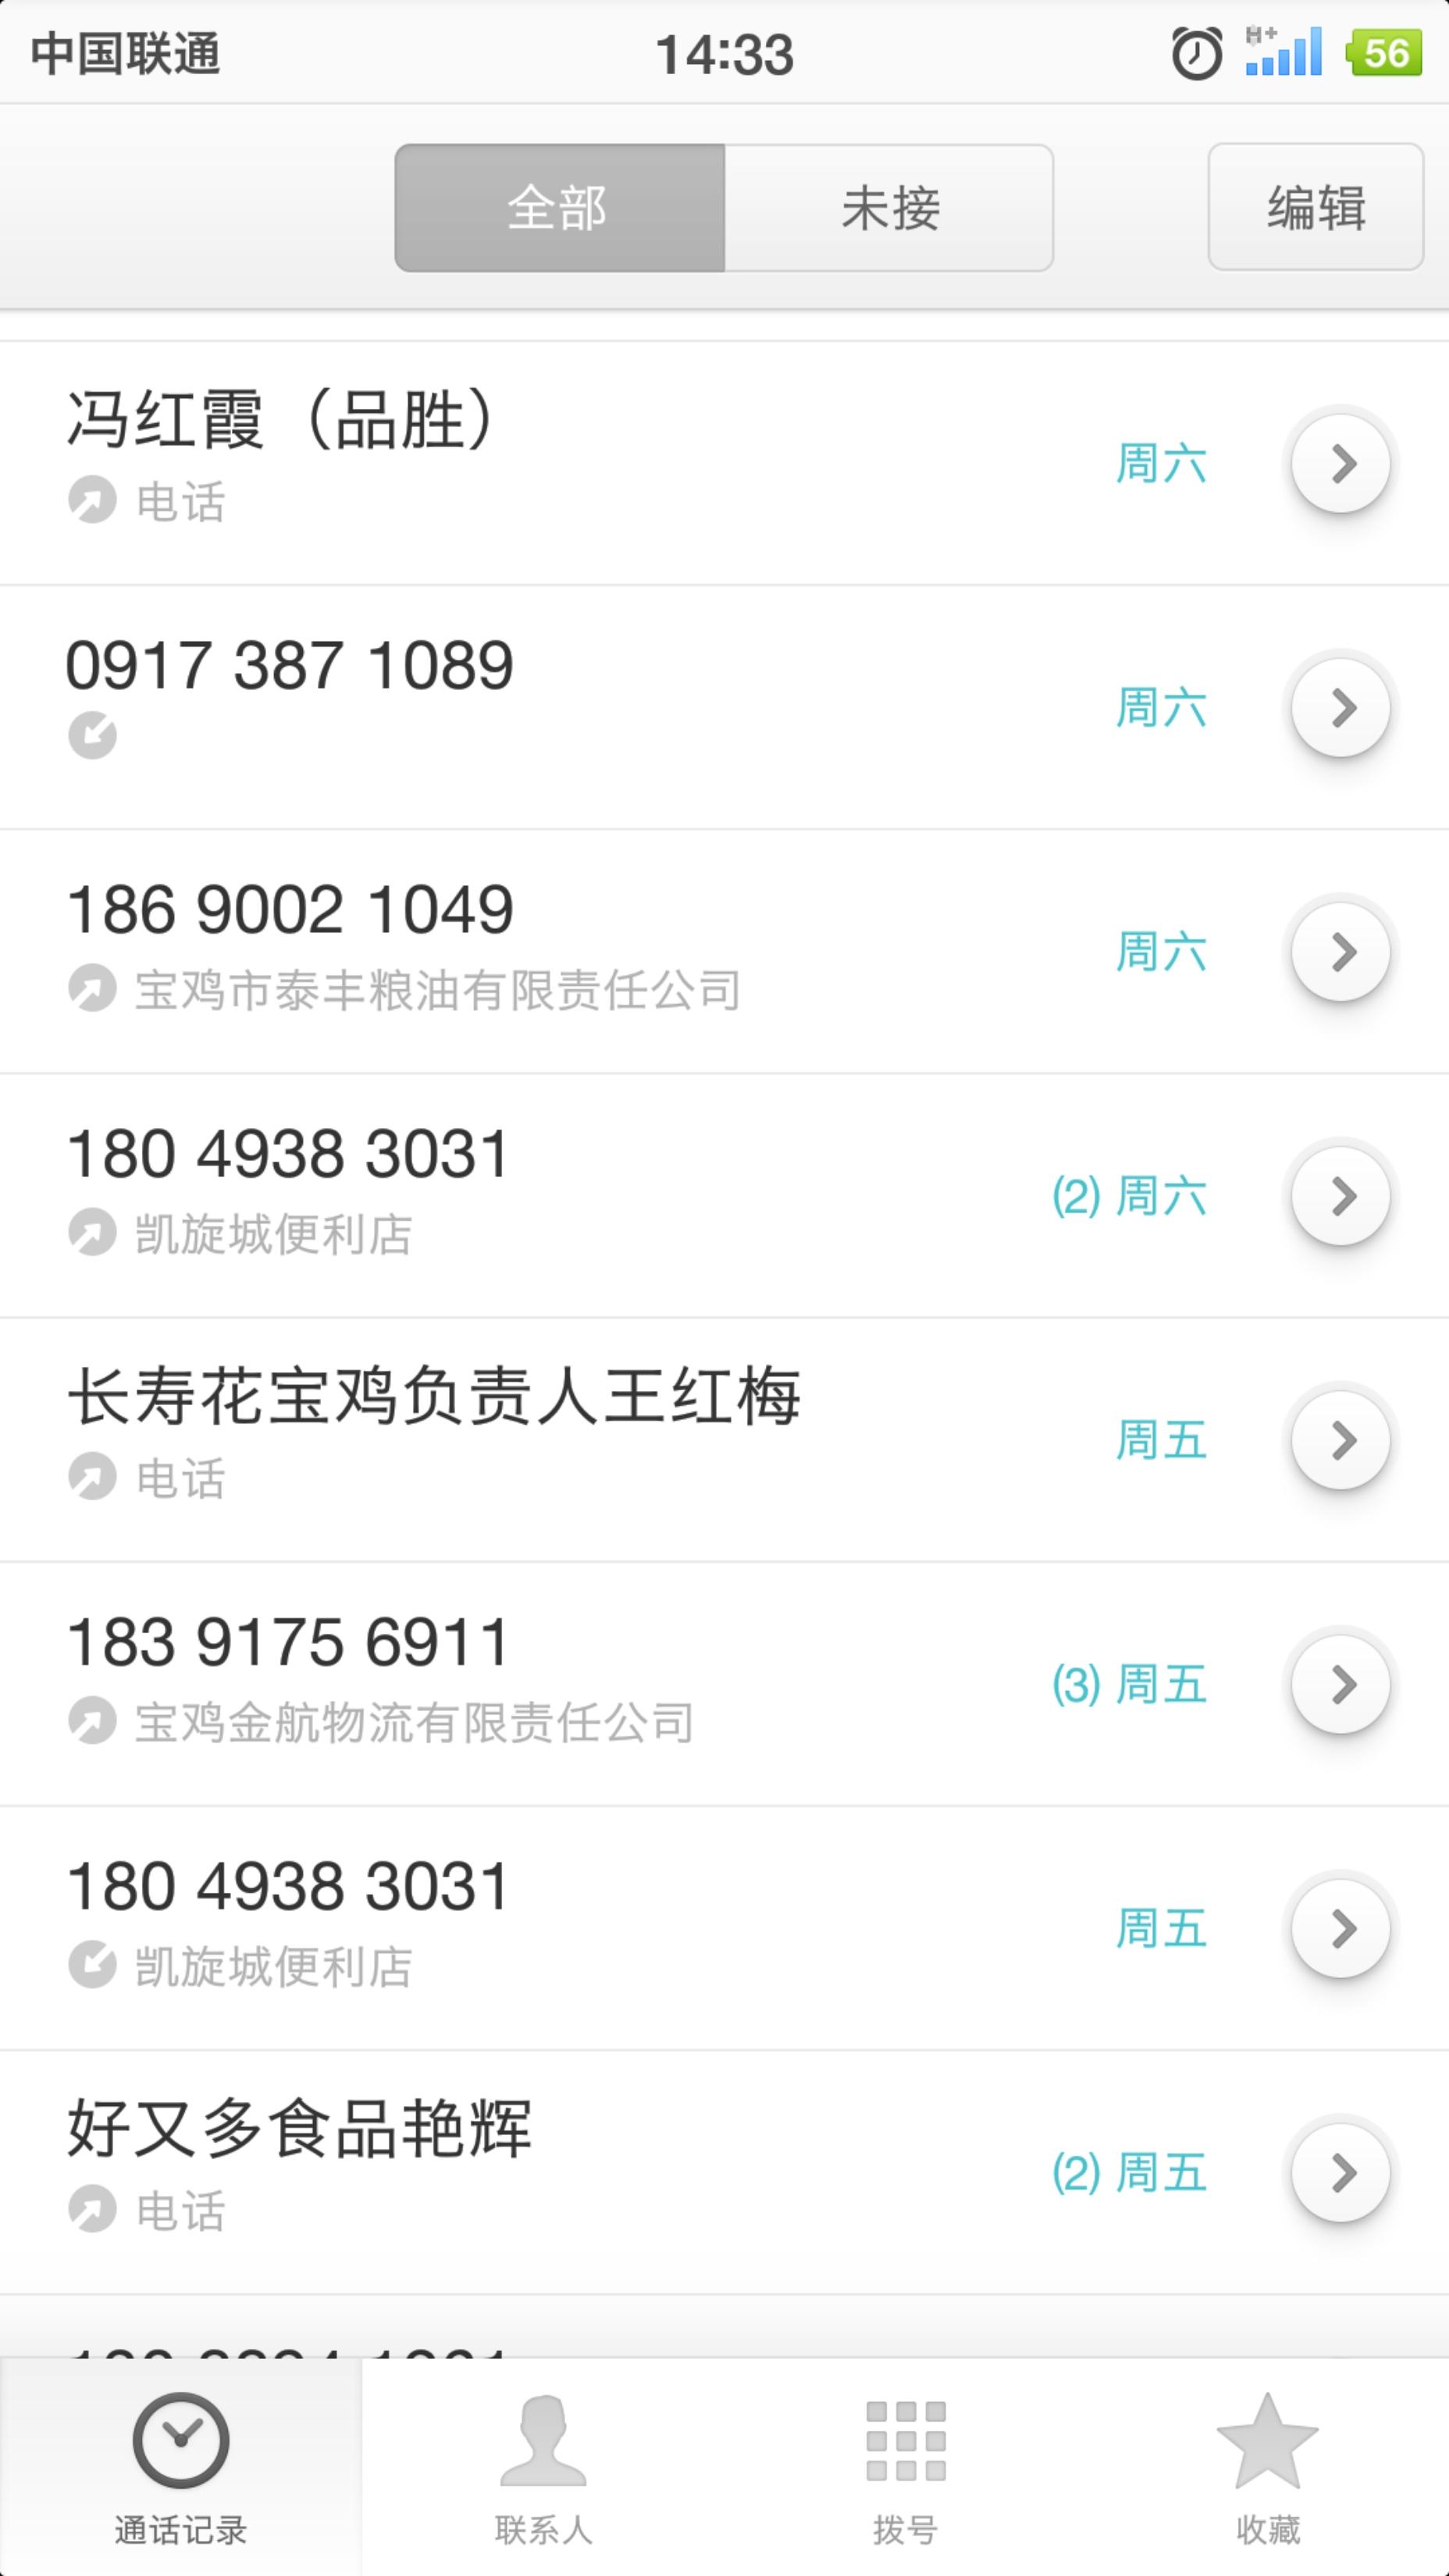 Screenshot_2019-08-13-14-33-22-307_??.png